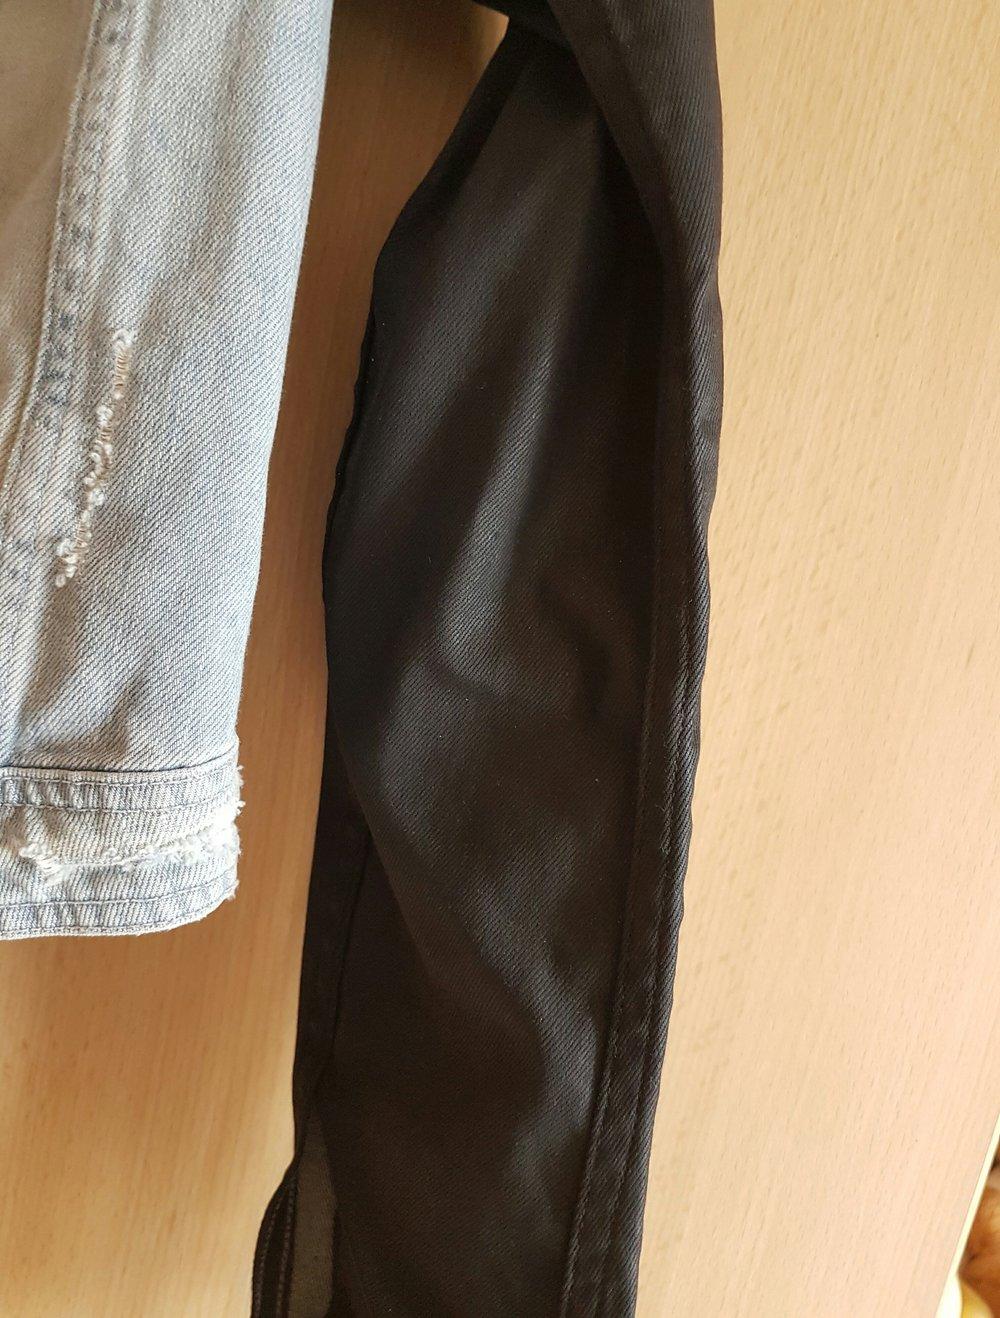 h m kurze jeansjacke mit schwarzen rmeln